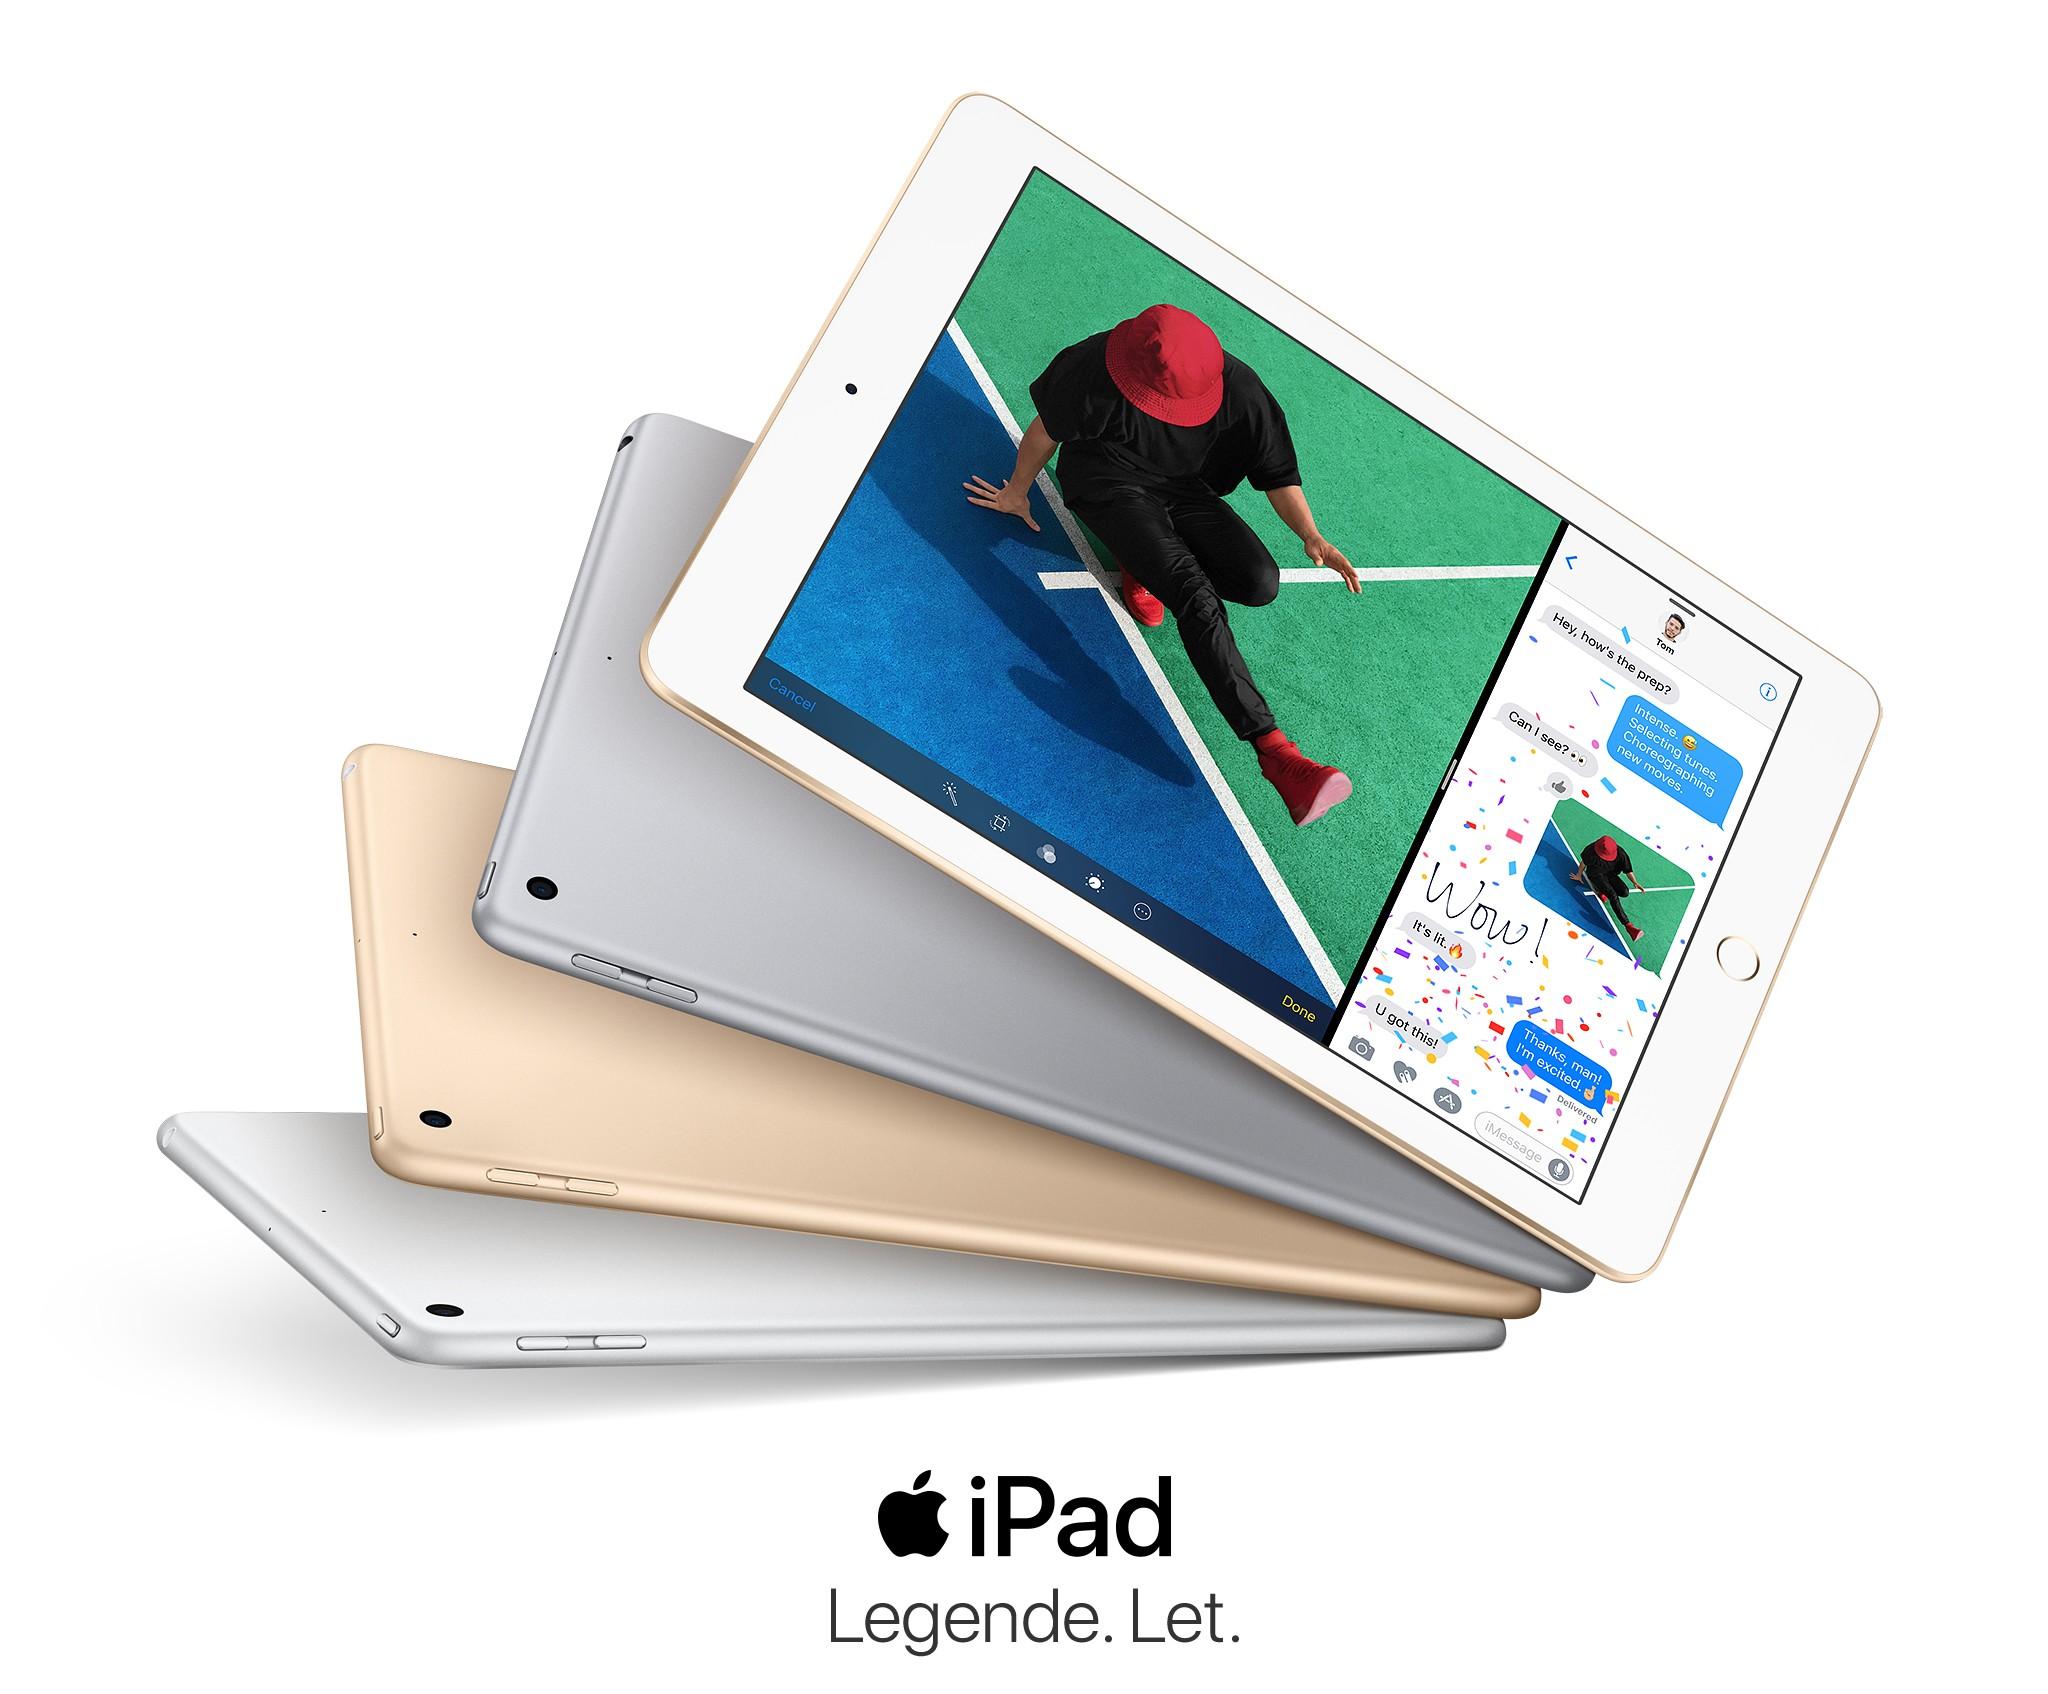 iPad - Legende let